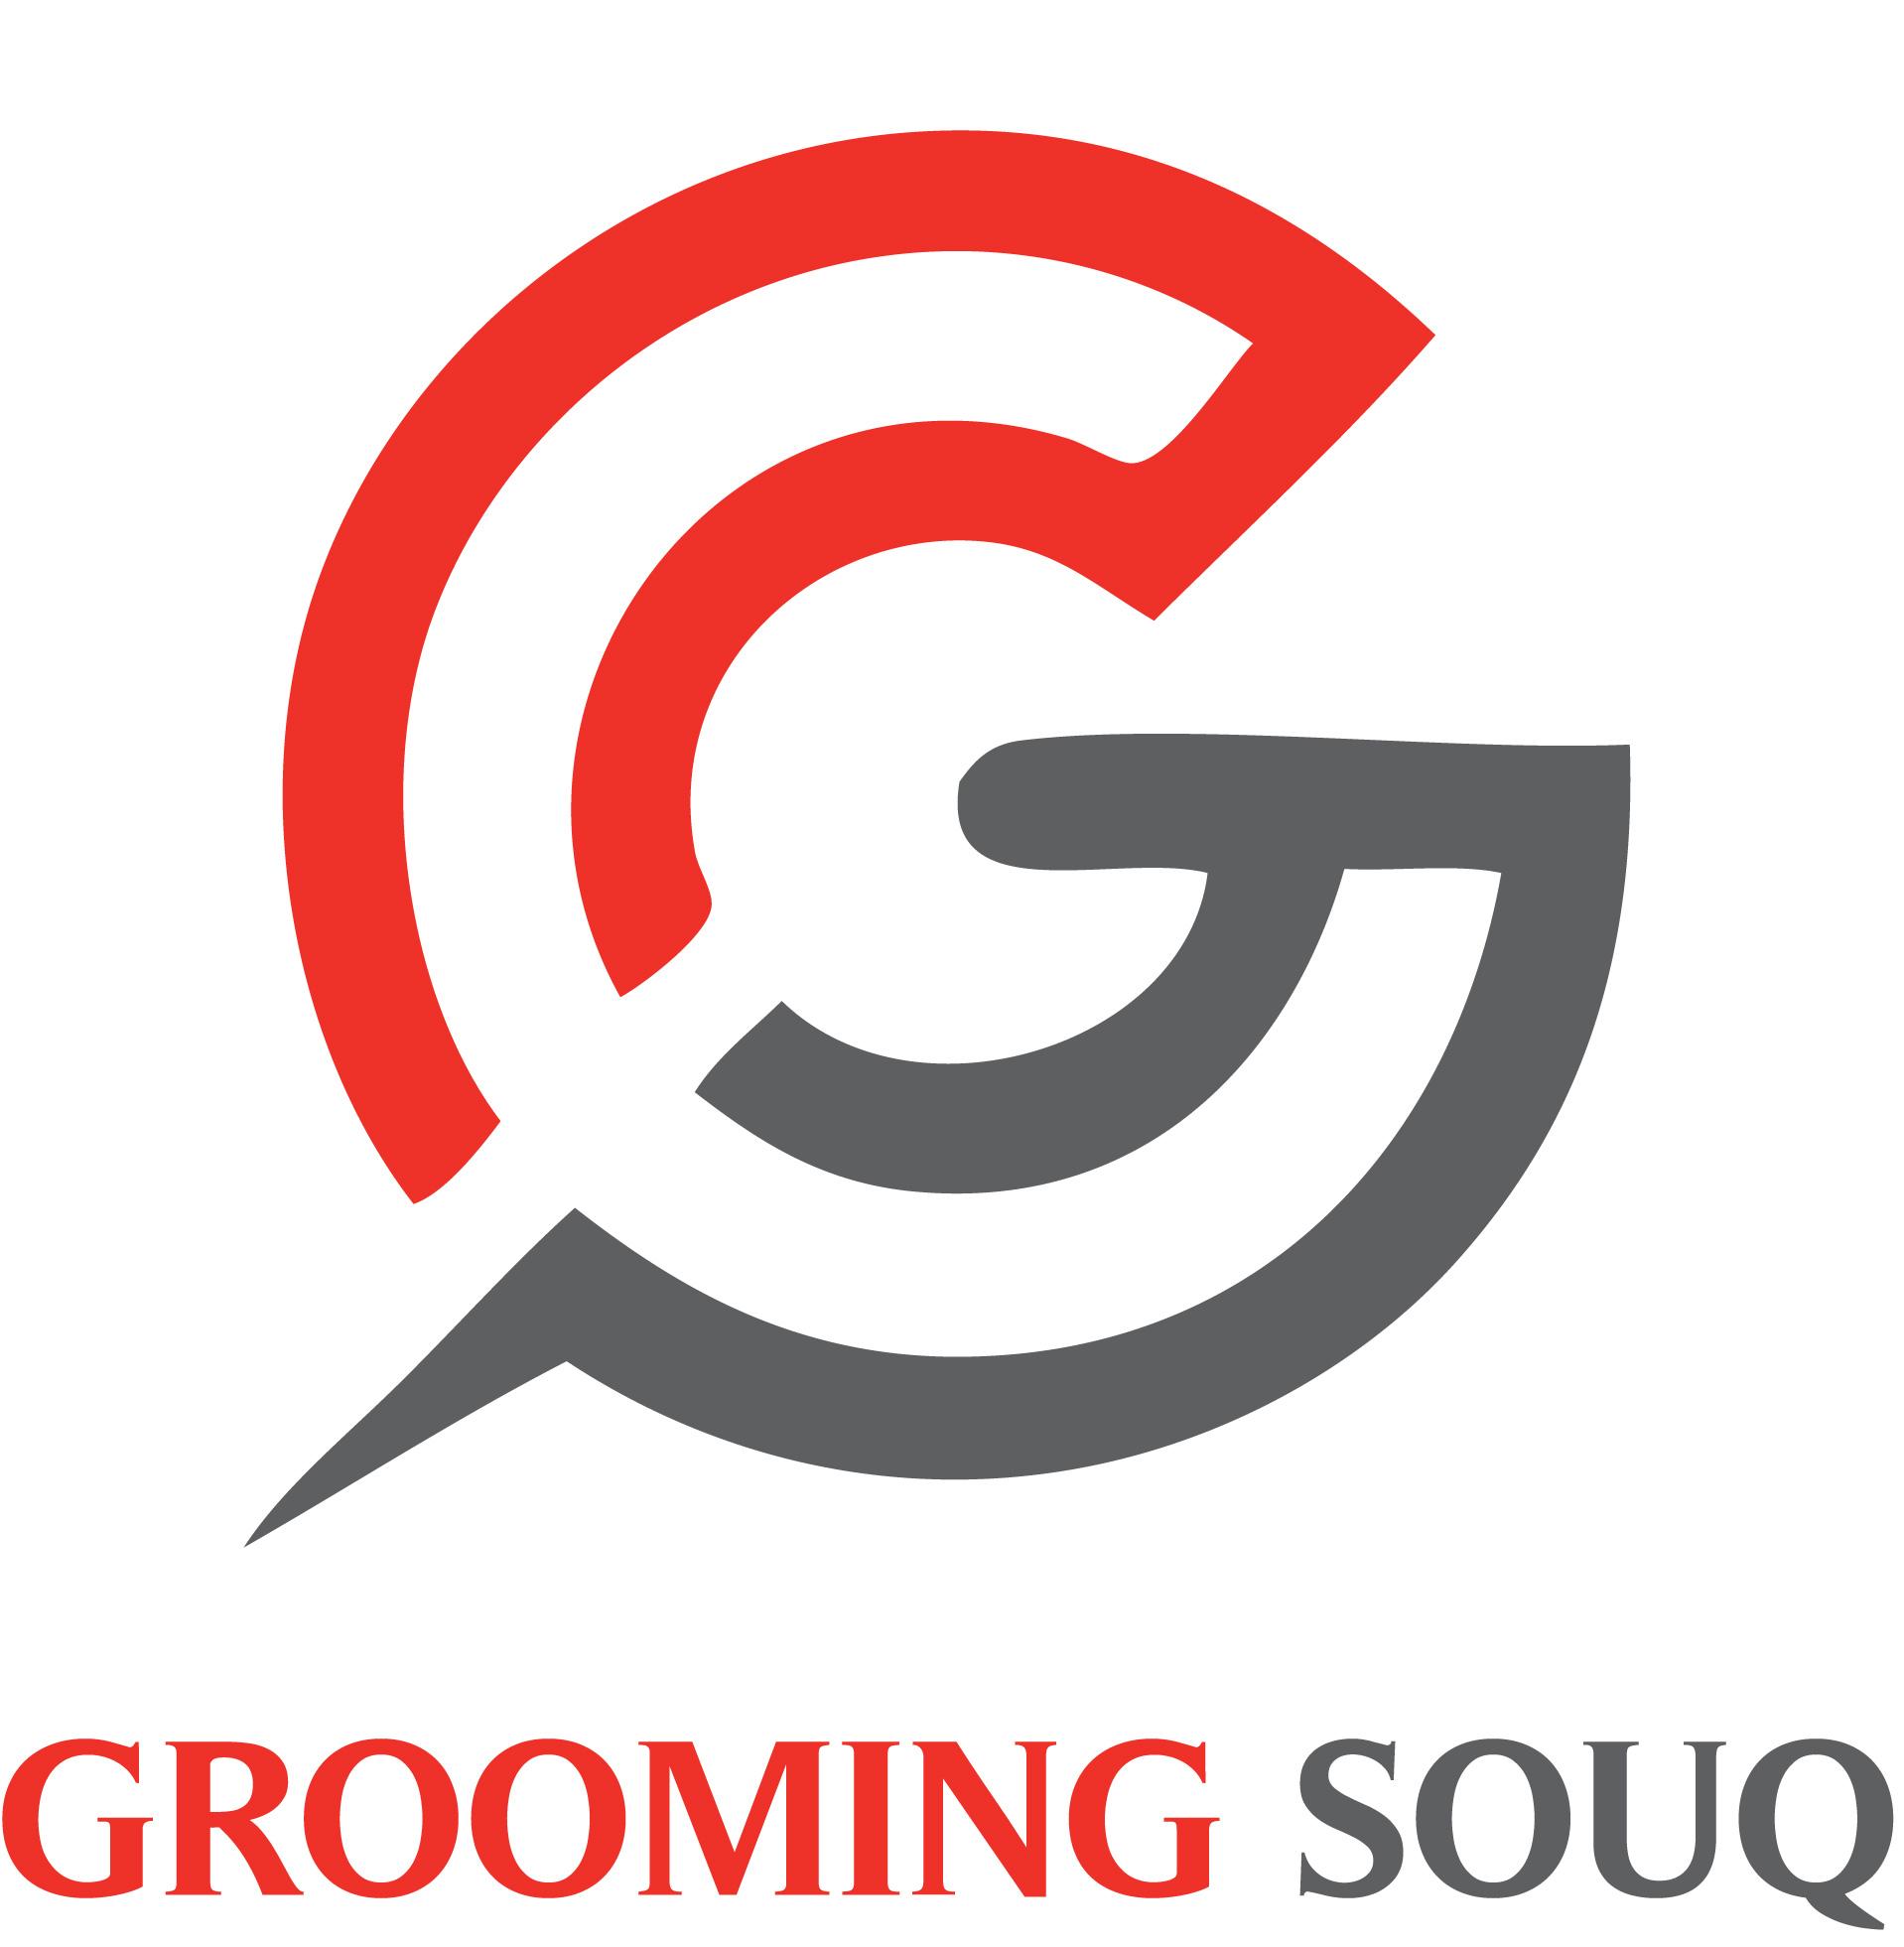 GroomingSouq.jpg